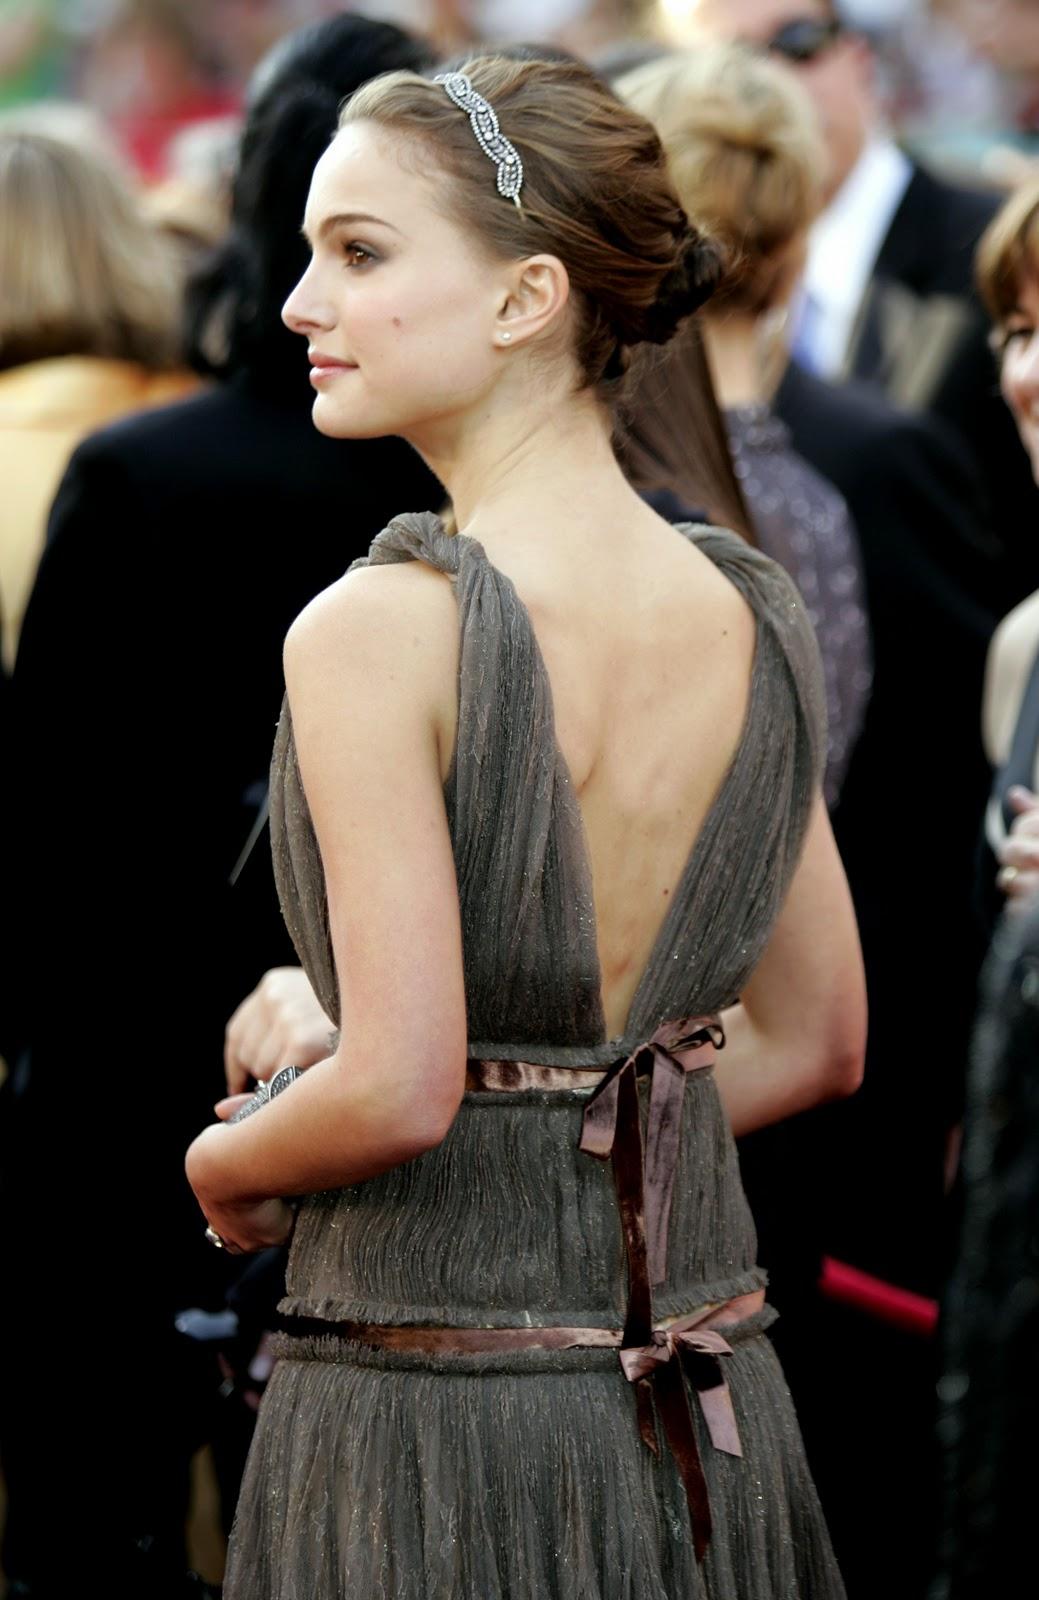 http://4.bp.blogspot.com/-YiQlq6Dml9Q/TsfqpDr0nfI/AAAAAAAAH3c/I8WPLvwQq_Q/s1600/Natalie-Portman-sexy-206349.jpg